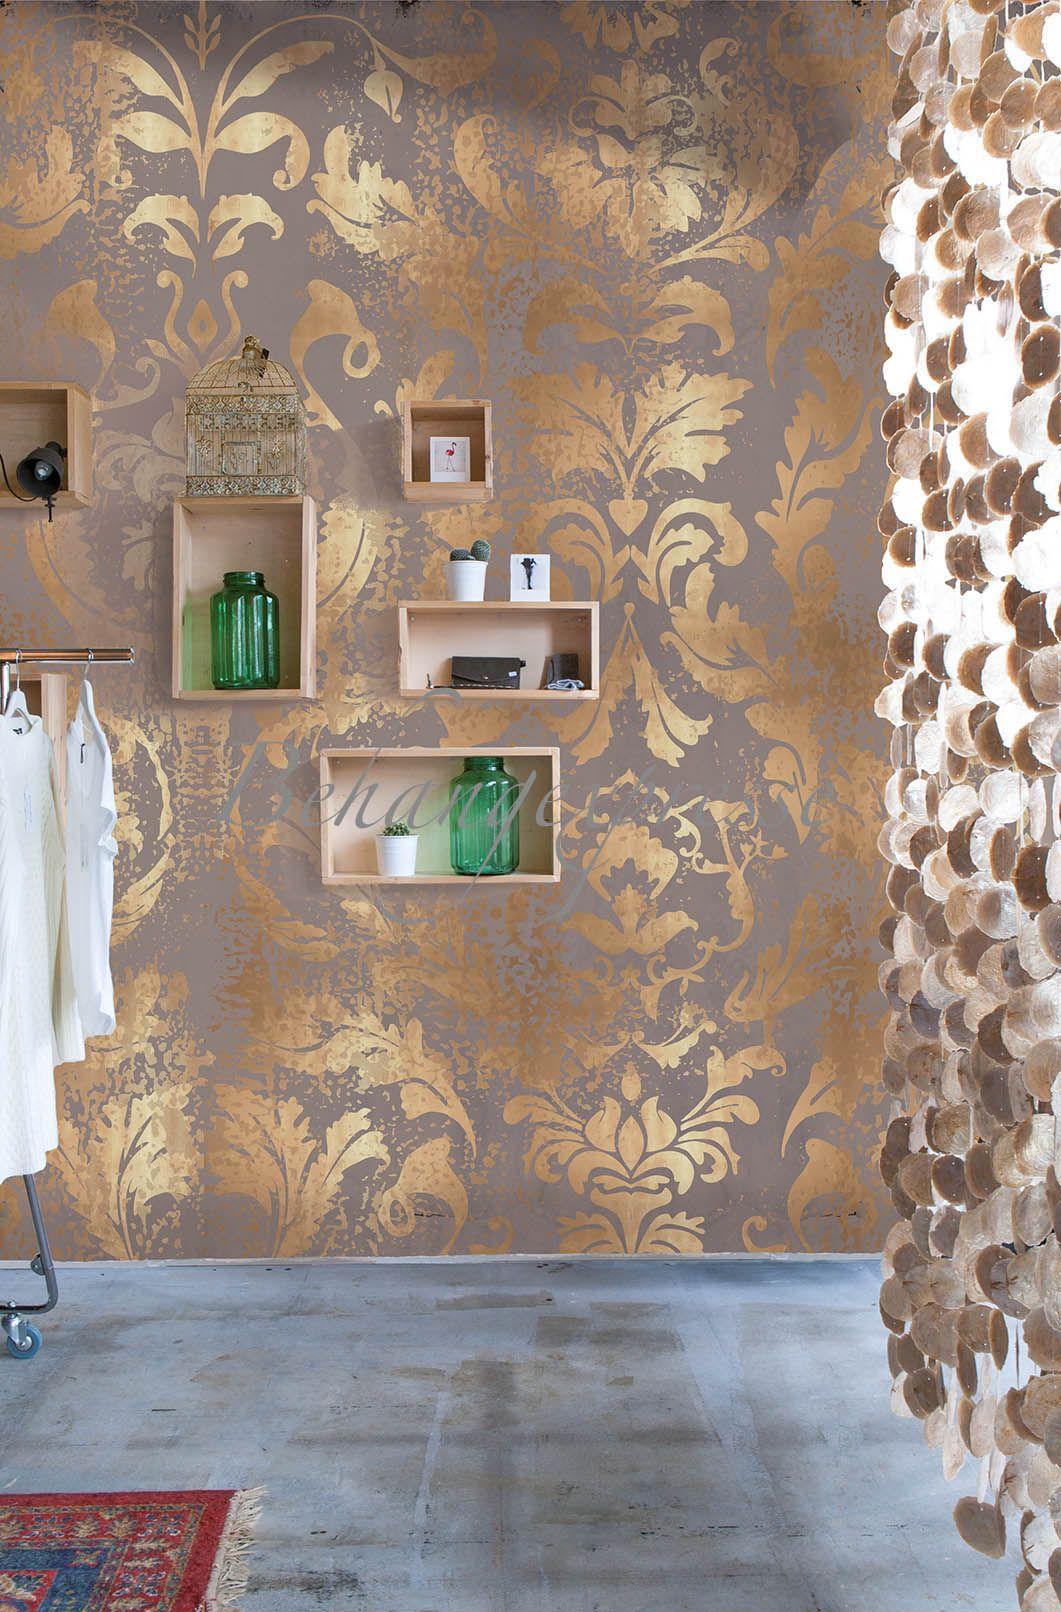 Vlies Foto Tapete Wandbild Barock Muster Ornament braun